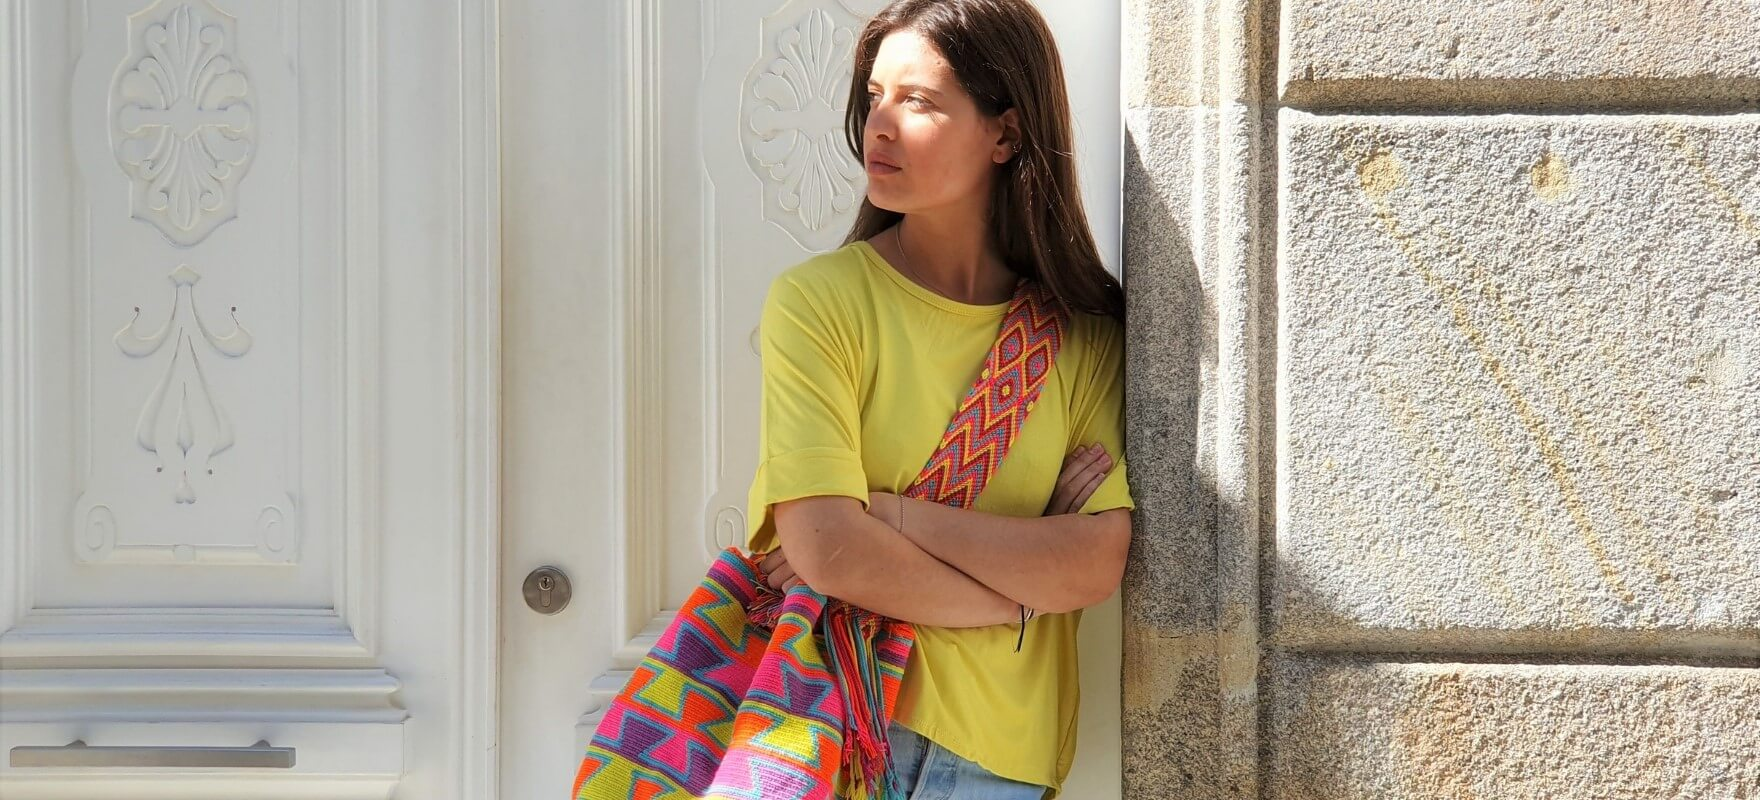 d51b7b08ffb Ropa de Moda Casual de Mujer ▷ Nº1 en España - Liberatta